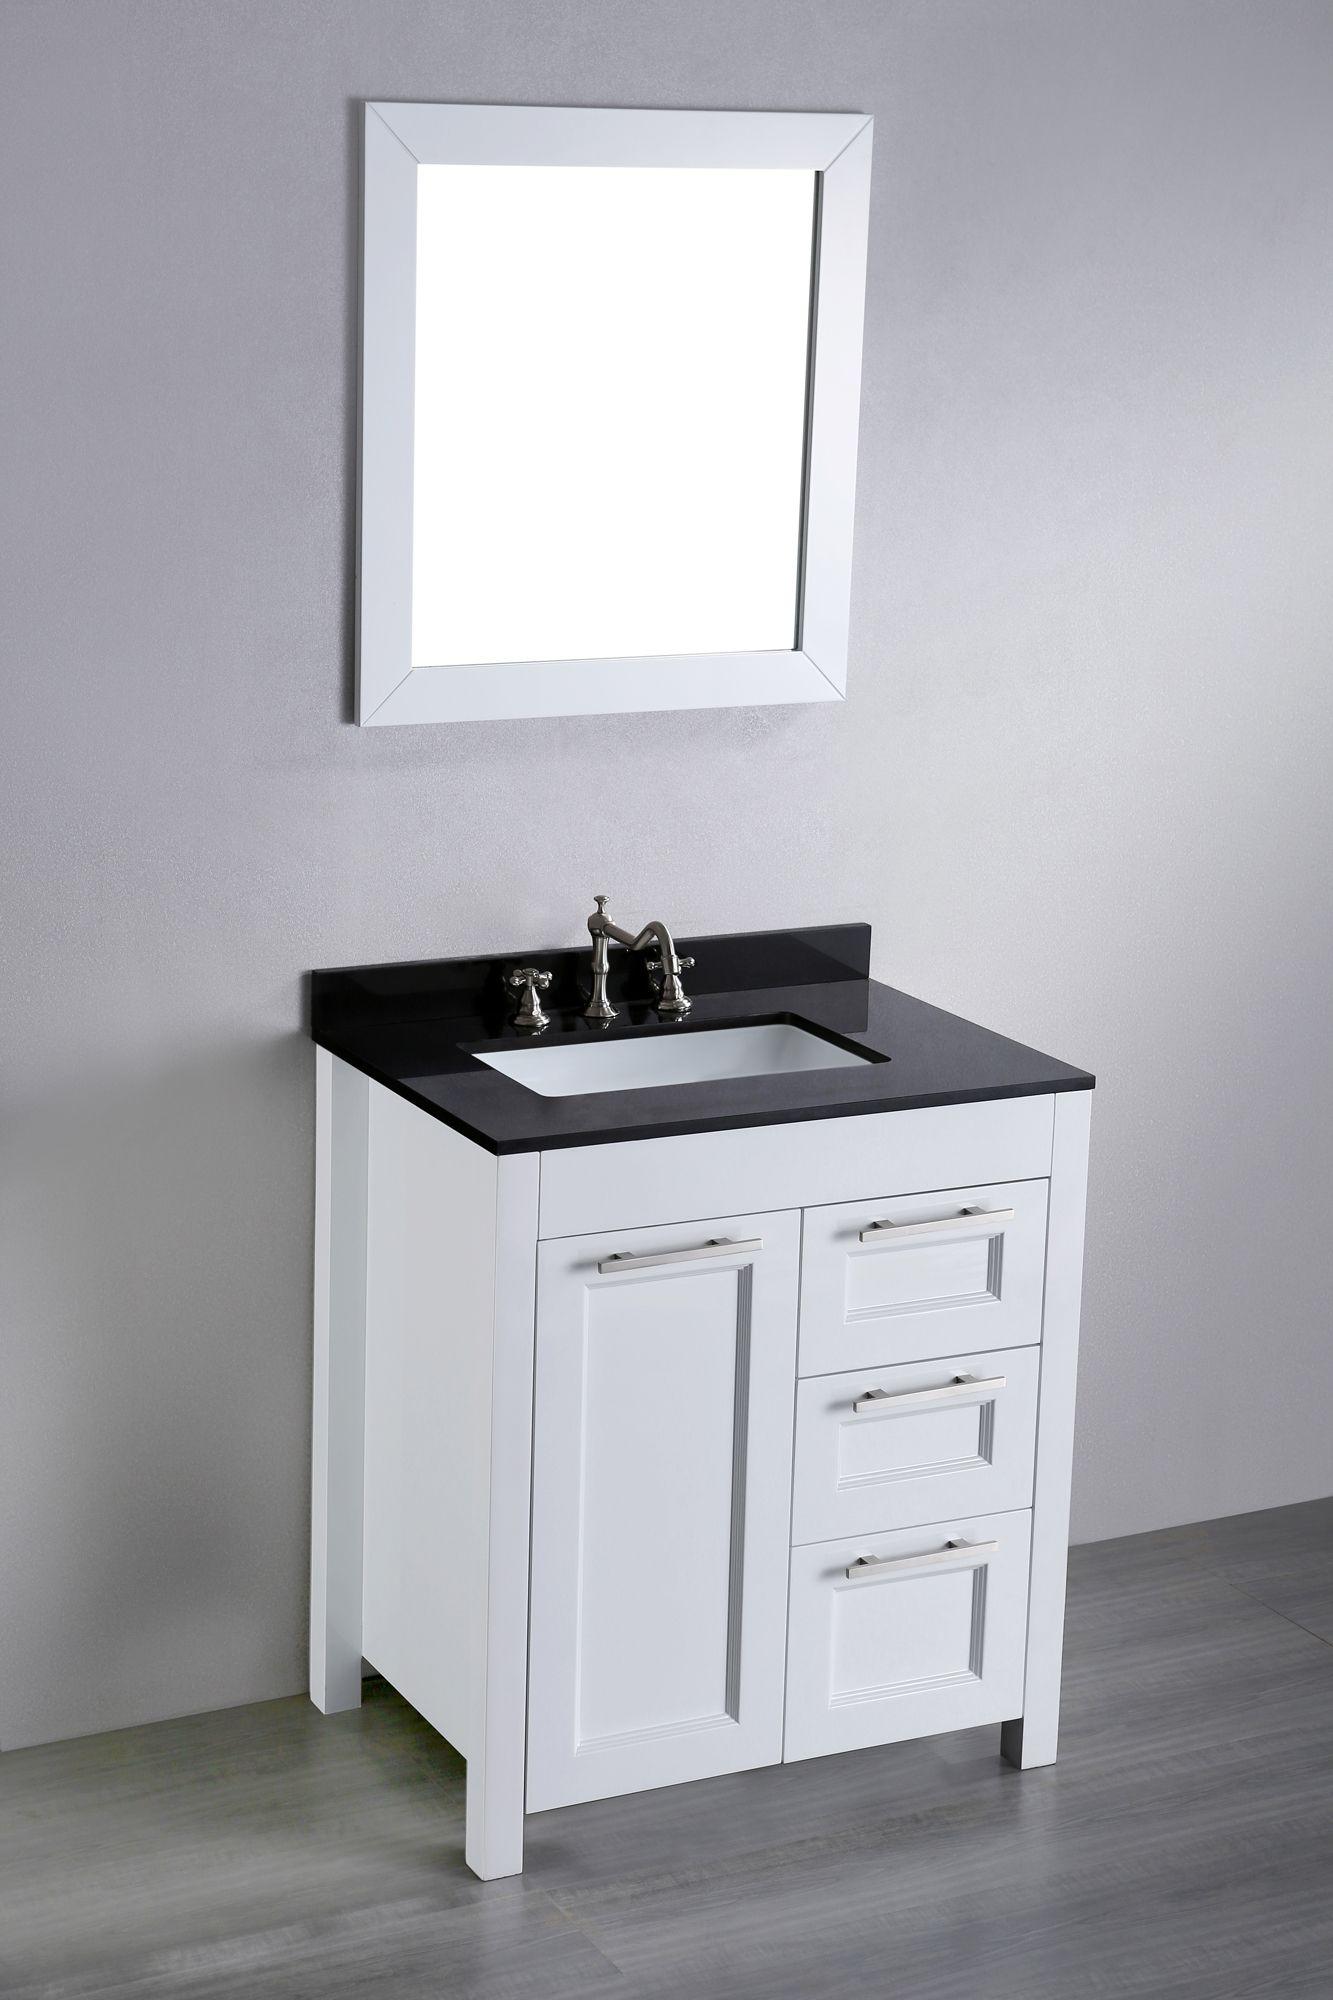 Pin On Small Bathroom Ideas